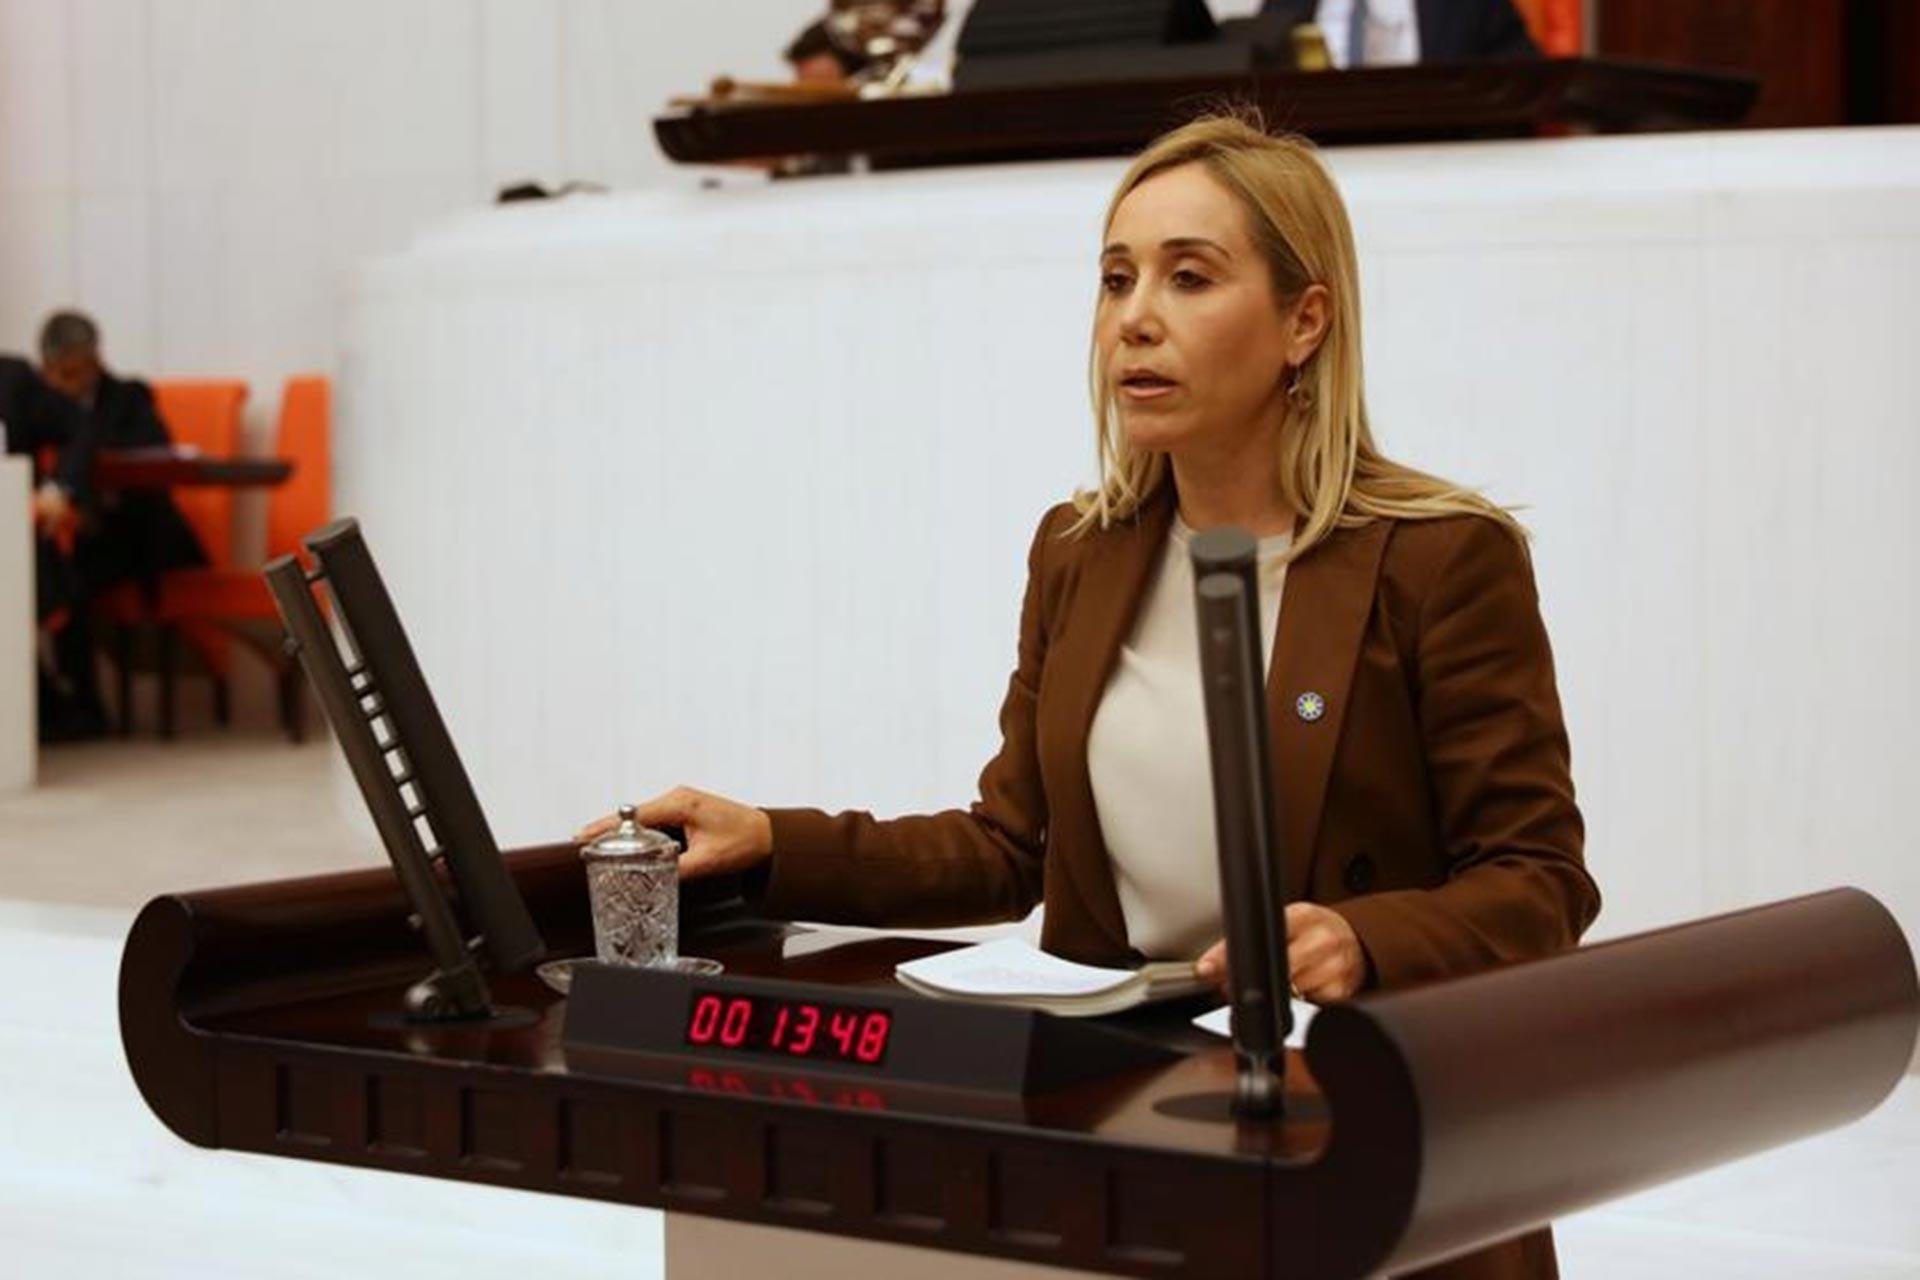 İYİ Parti Milletvekili Dr. Tuba Vural Çokal Meclis kürsüsünde konuşurken